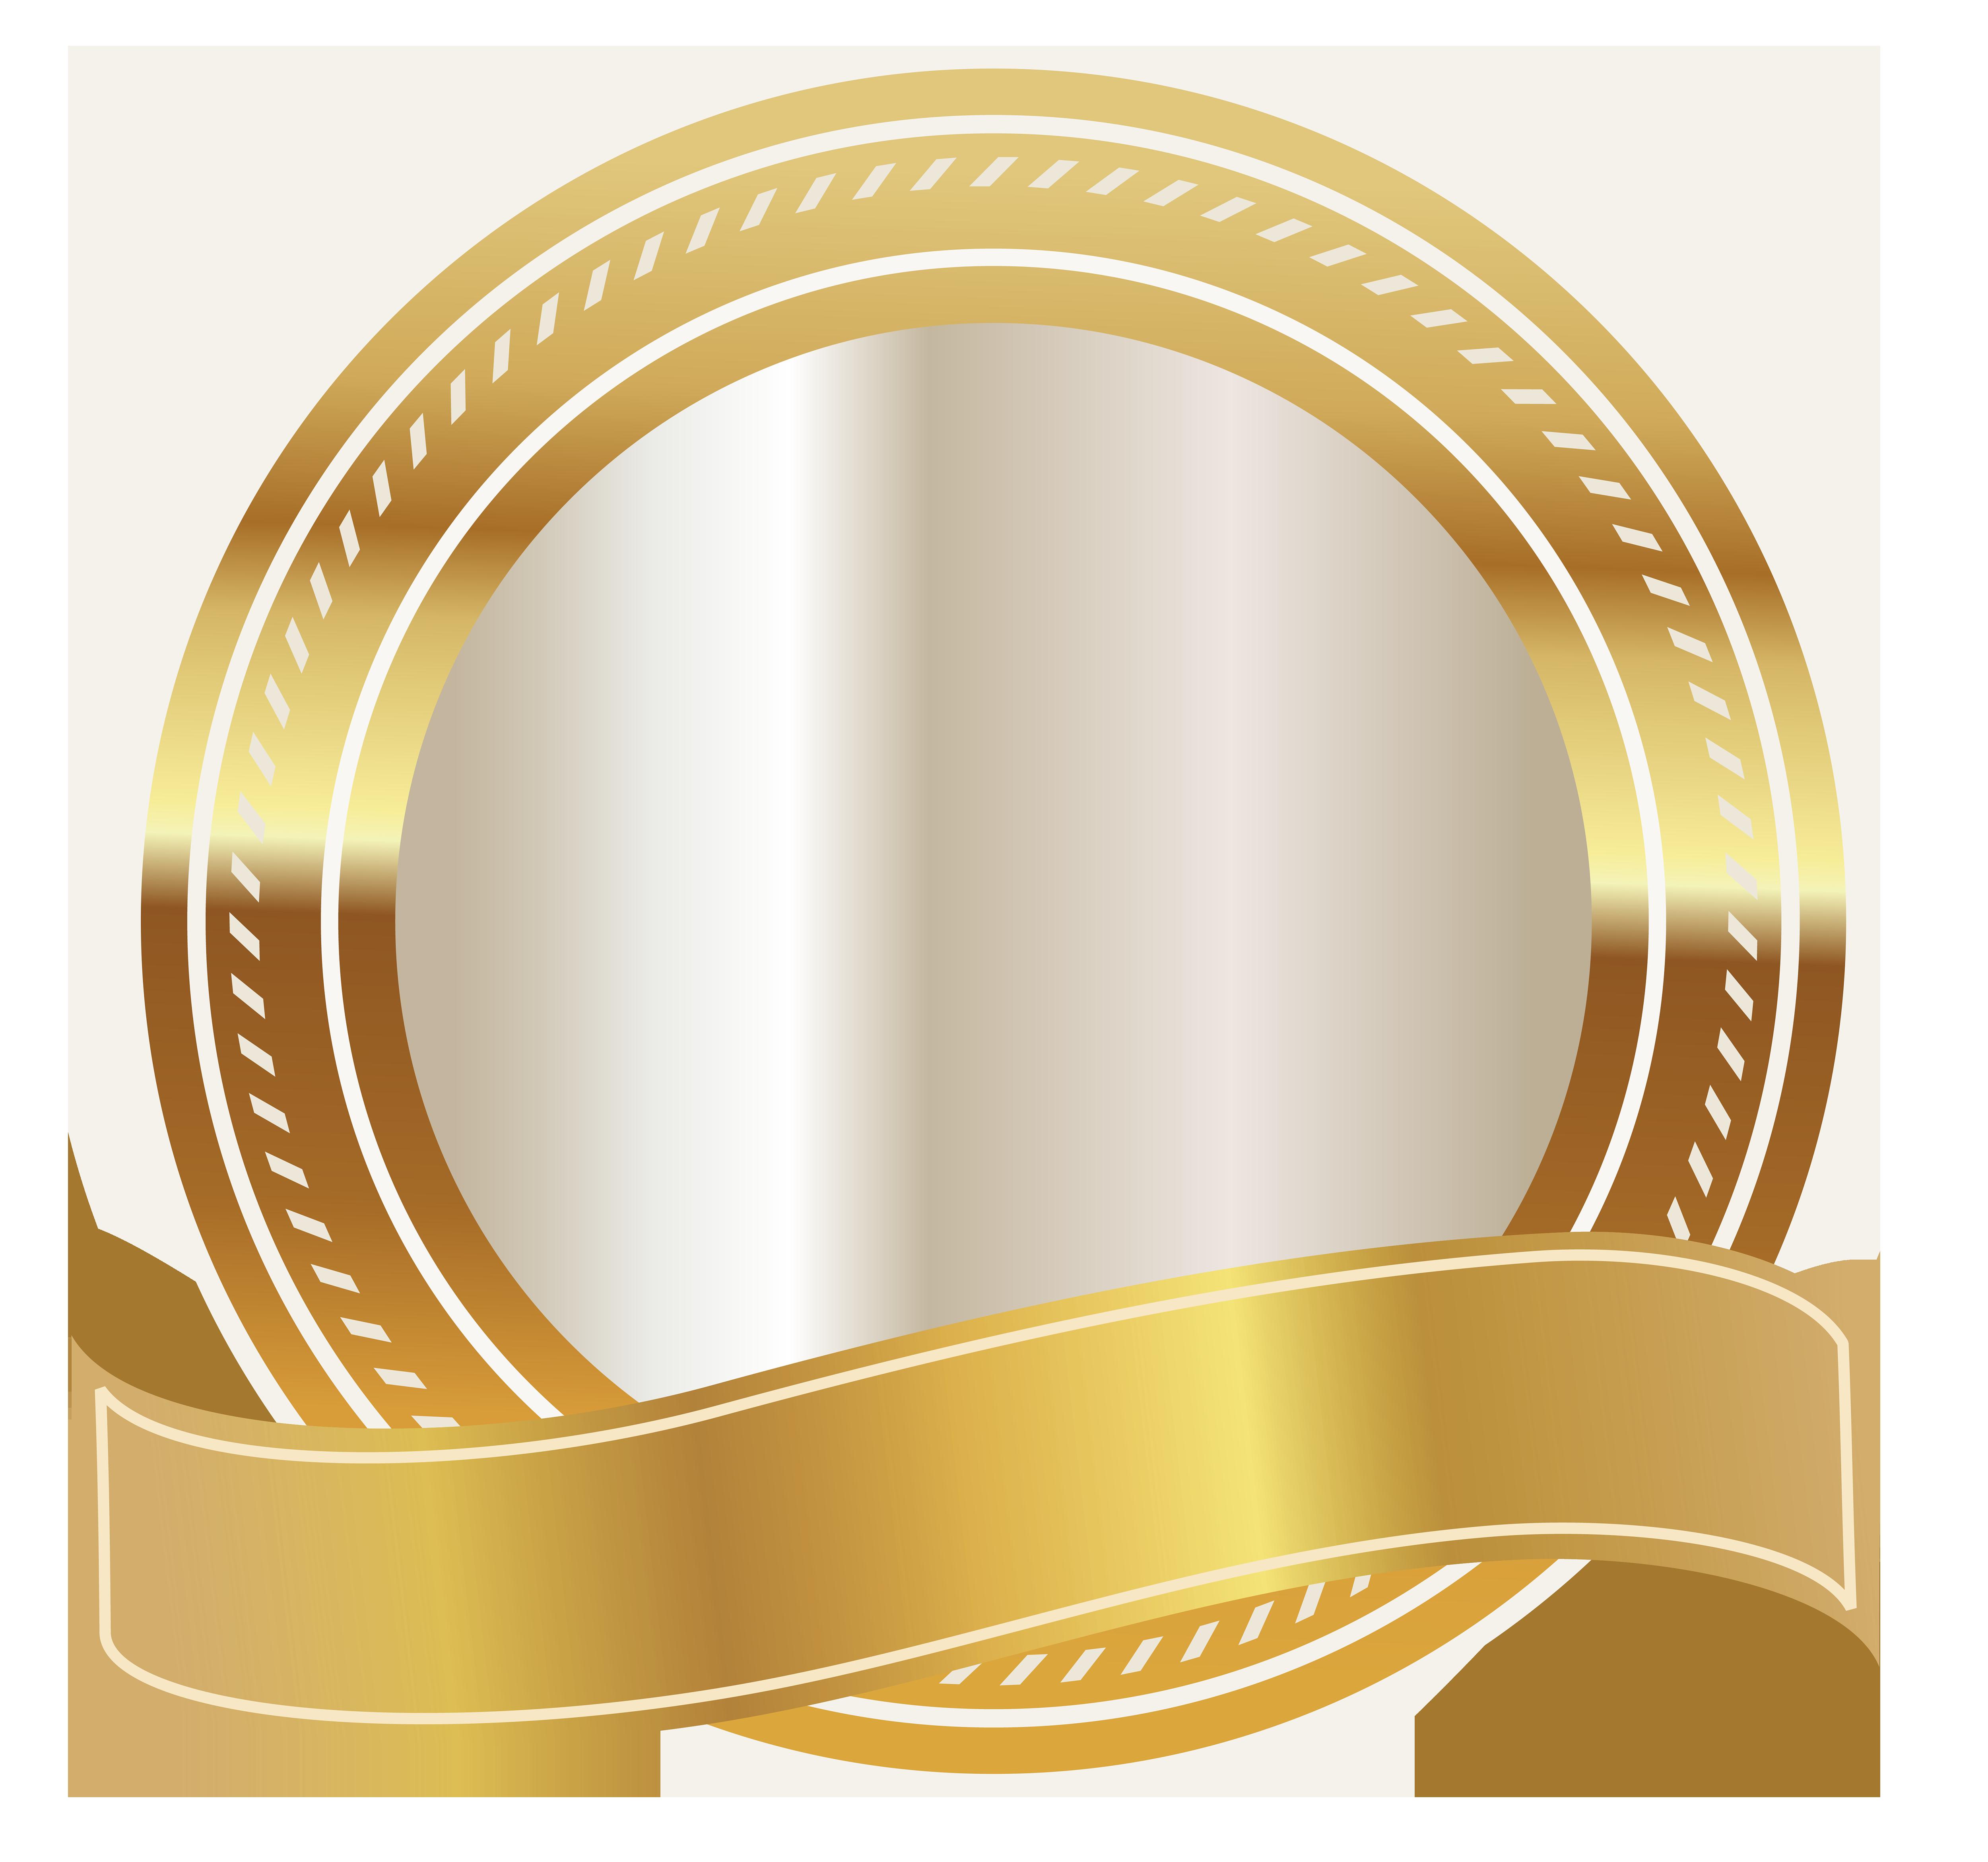 free photo gold ribbon ribbon yellow isolated free download